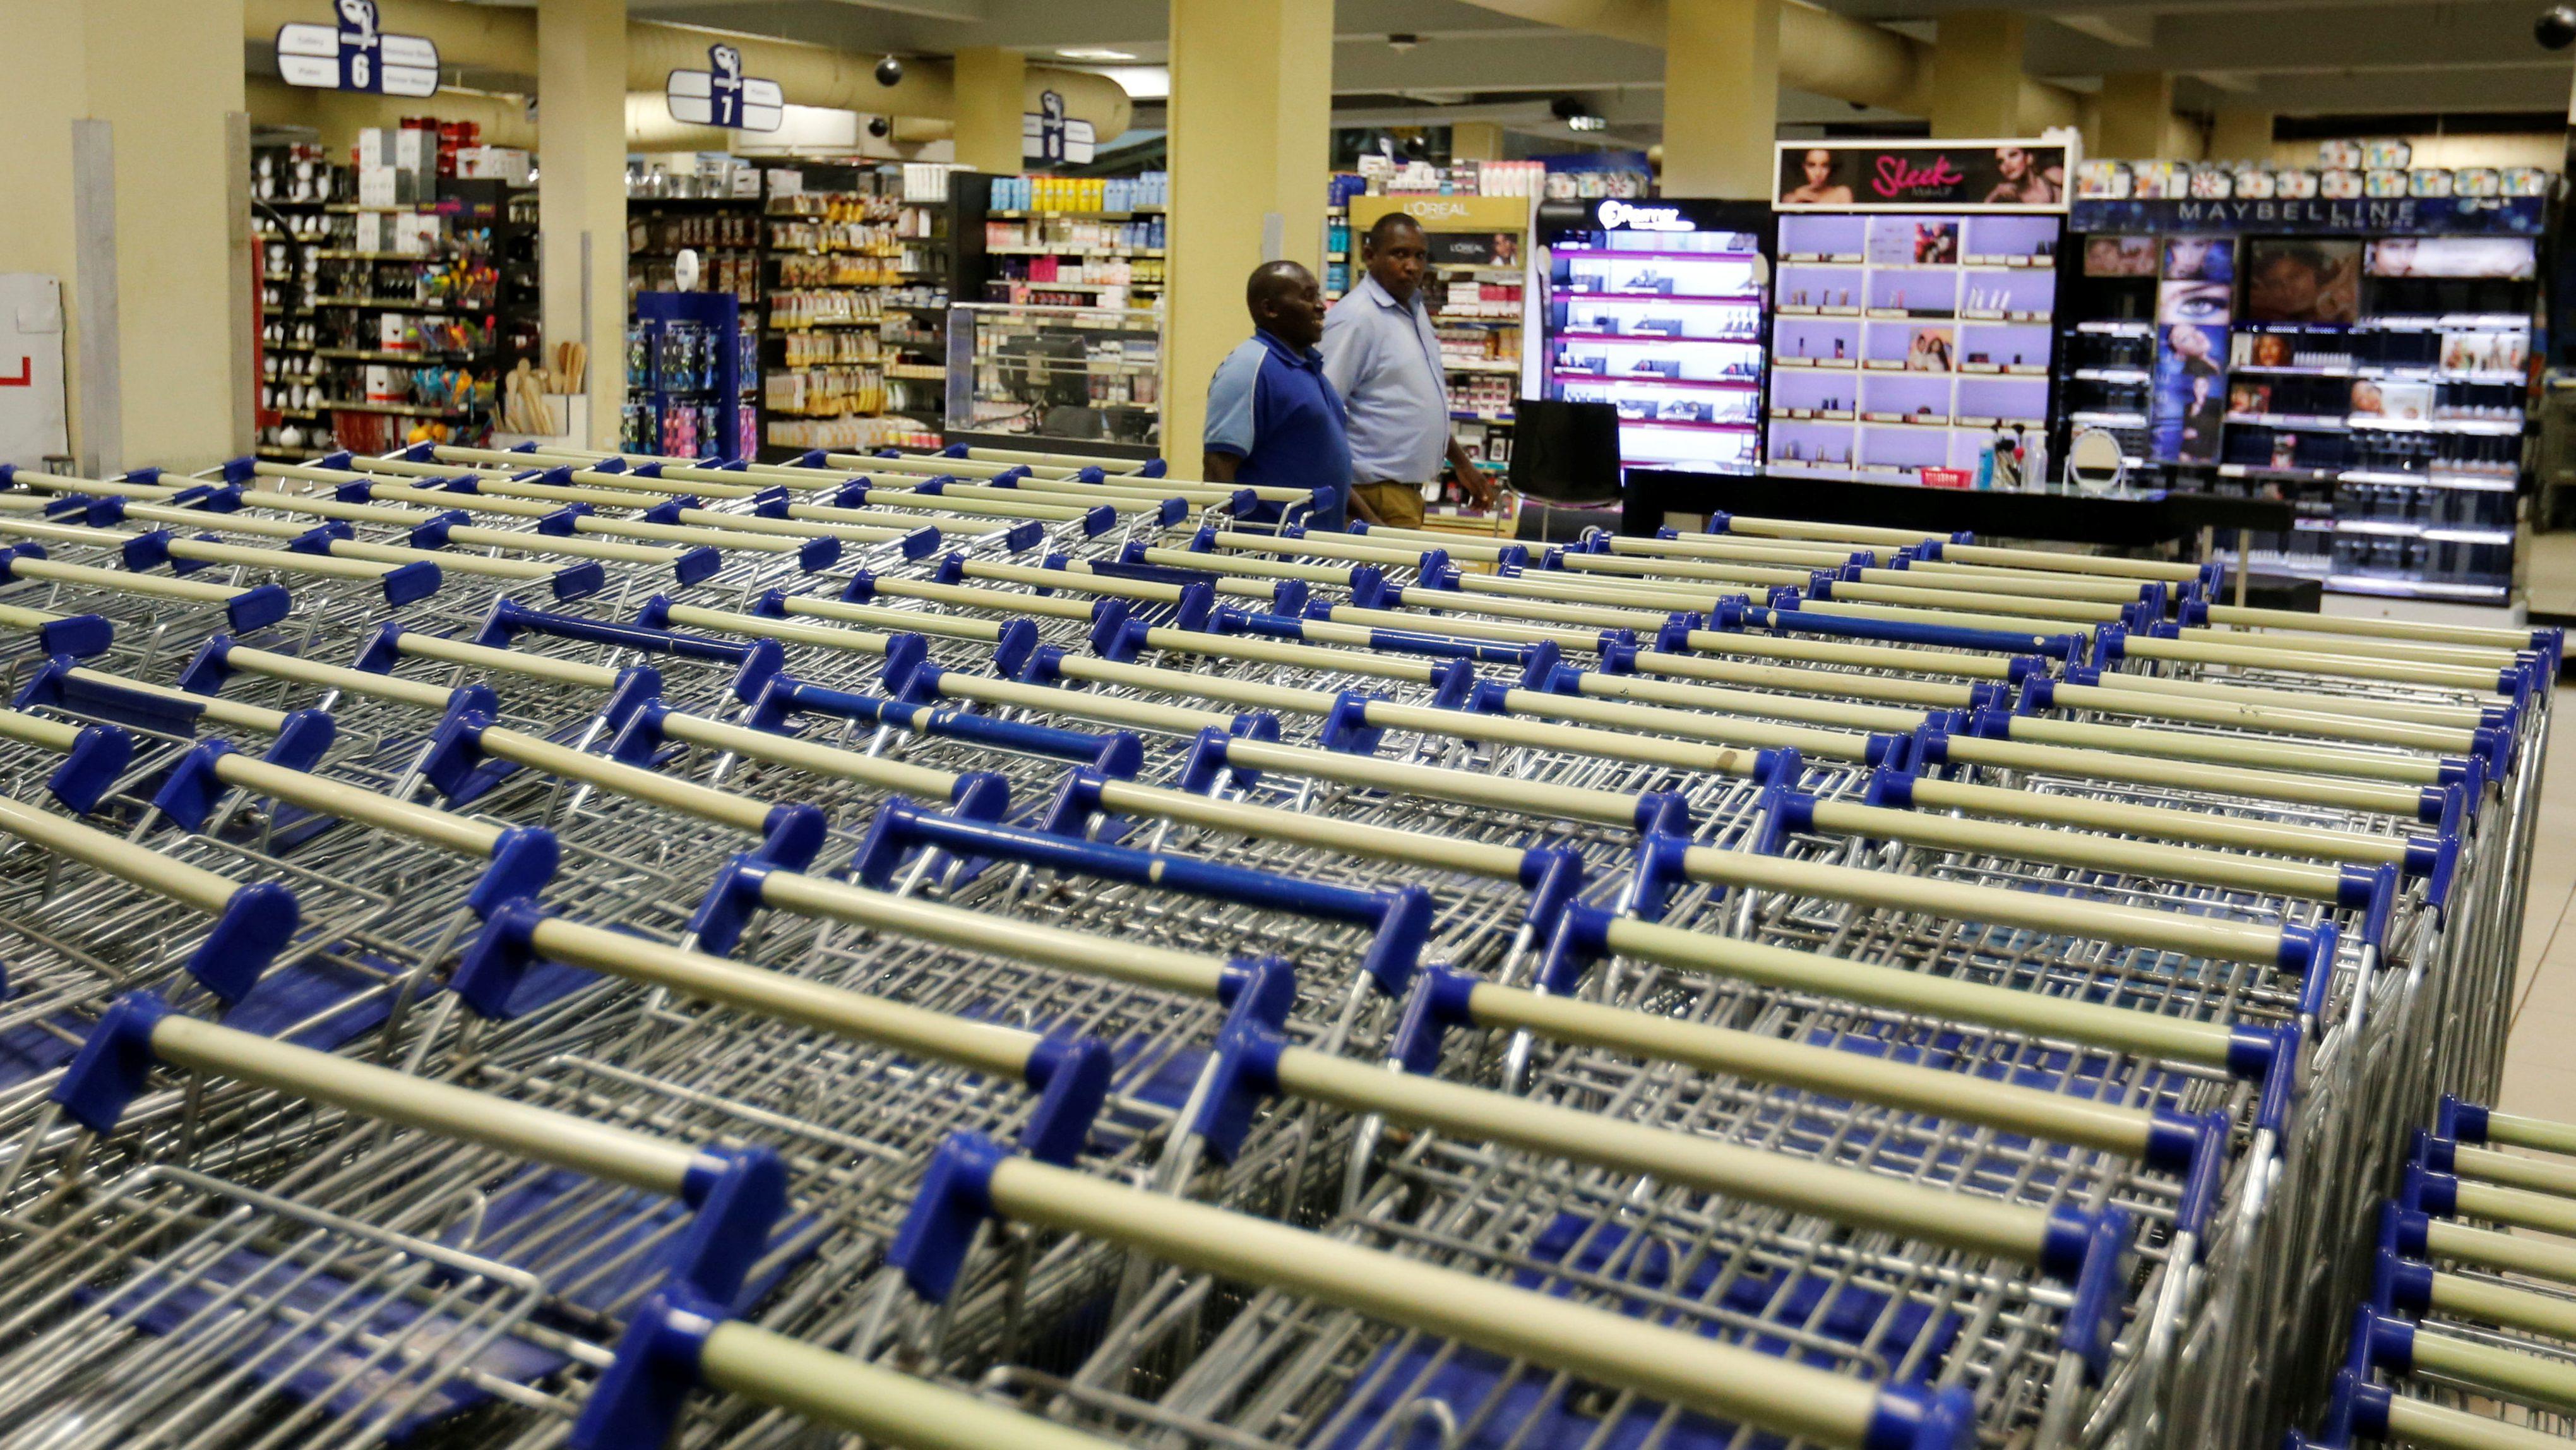 Shopping trolleys are seen arranged inside the Nakumatt supermarket within the Village market complex mall, in Nairobi, Kenya.